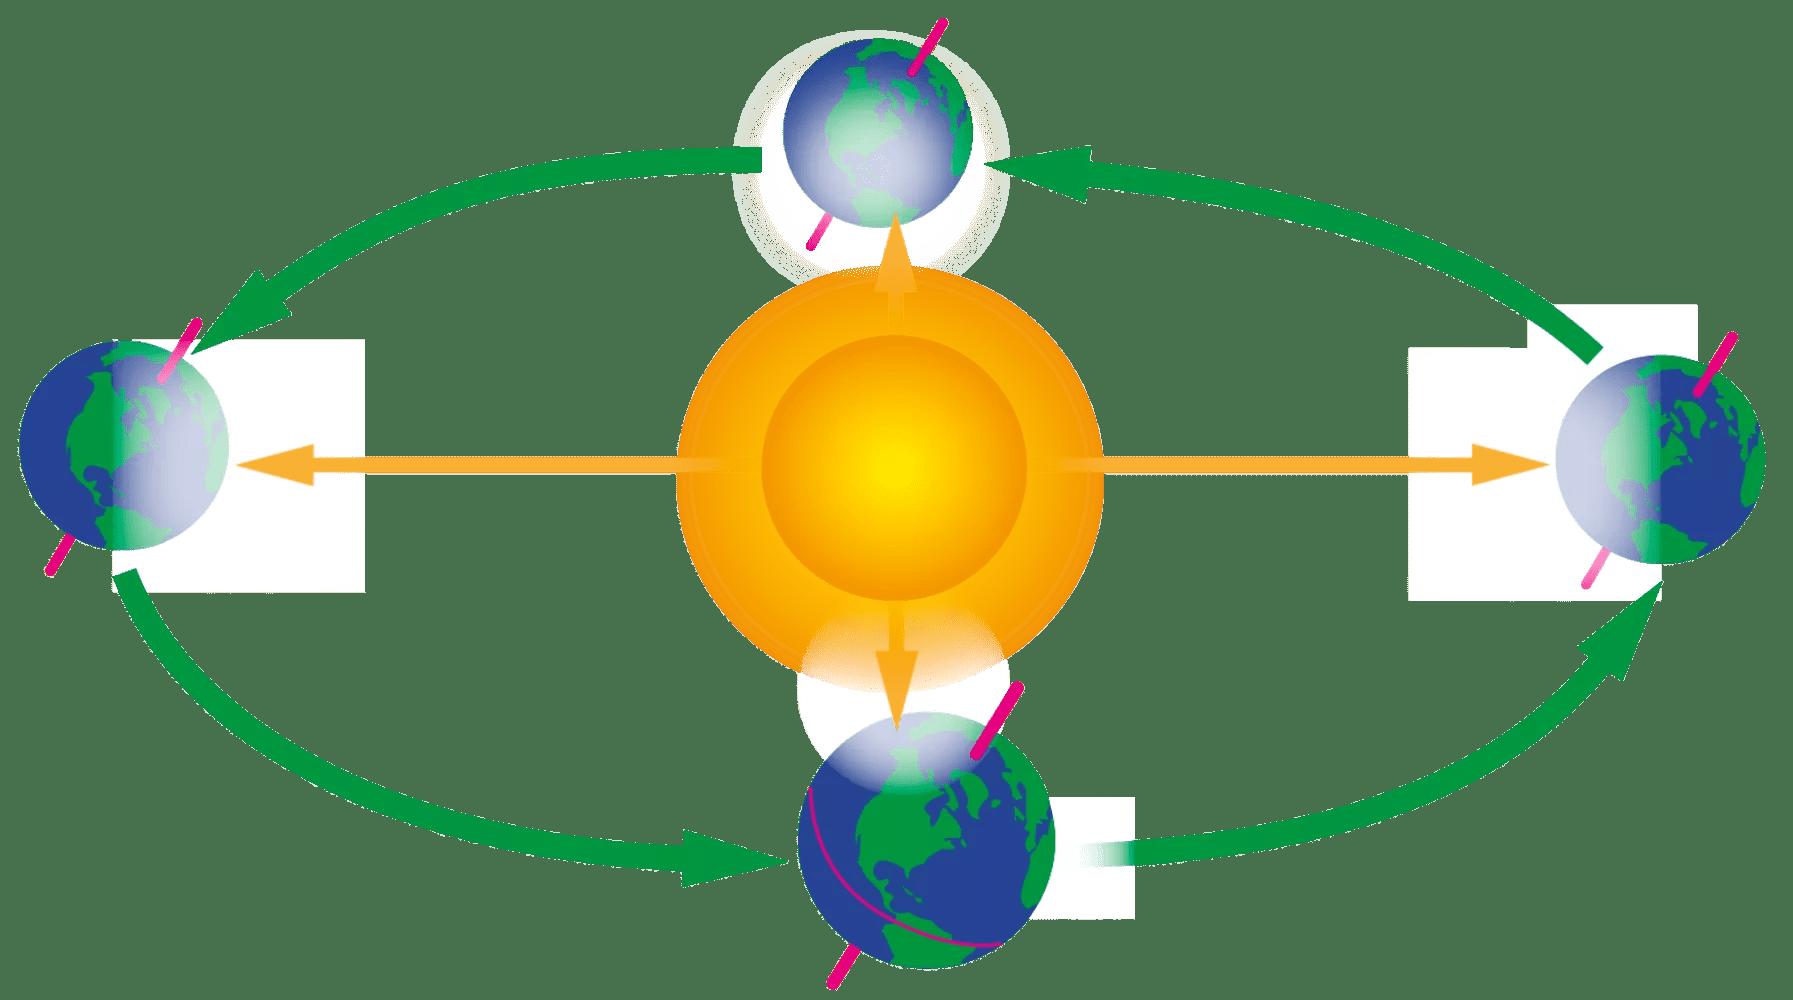 Earth S Orbit